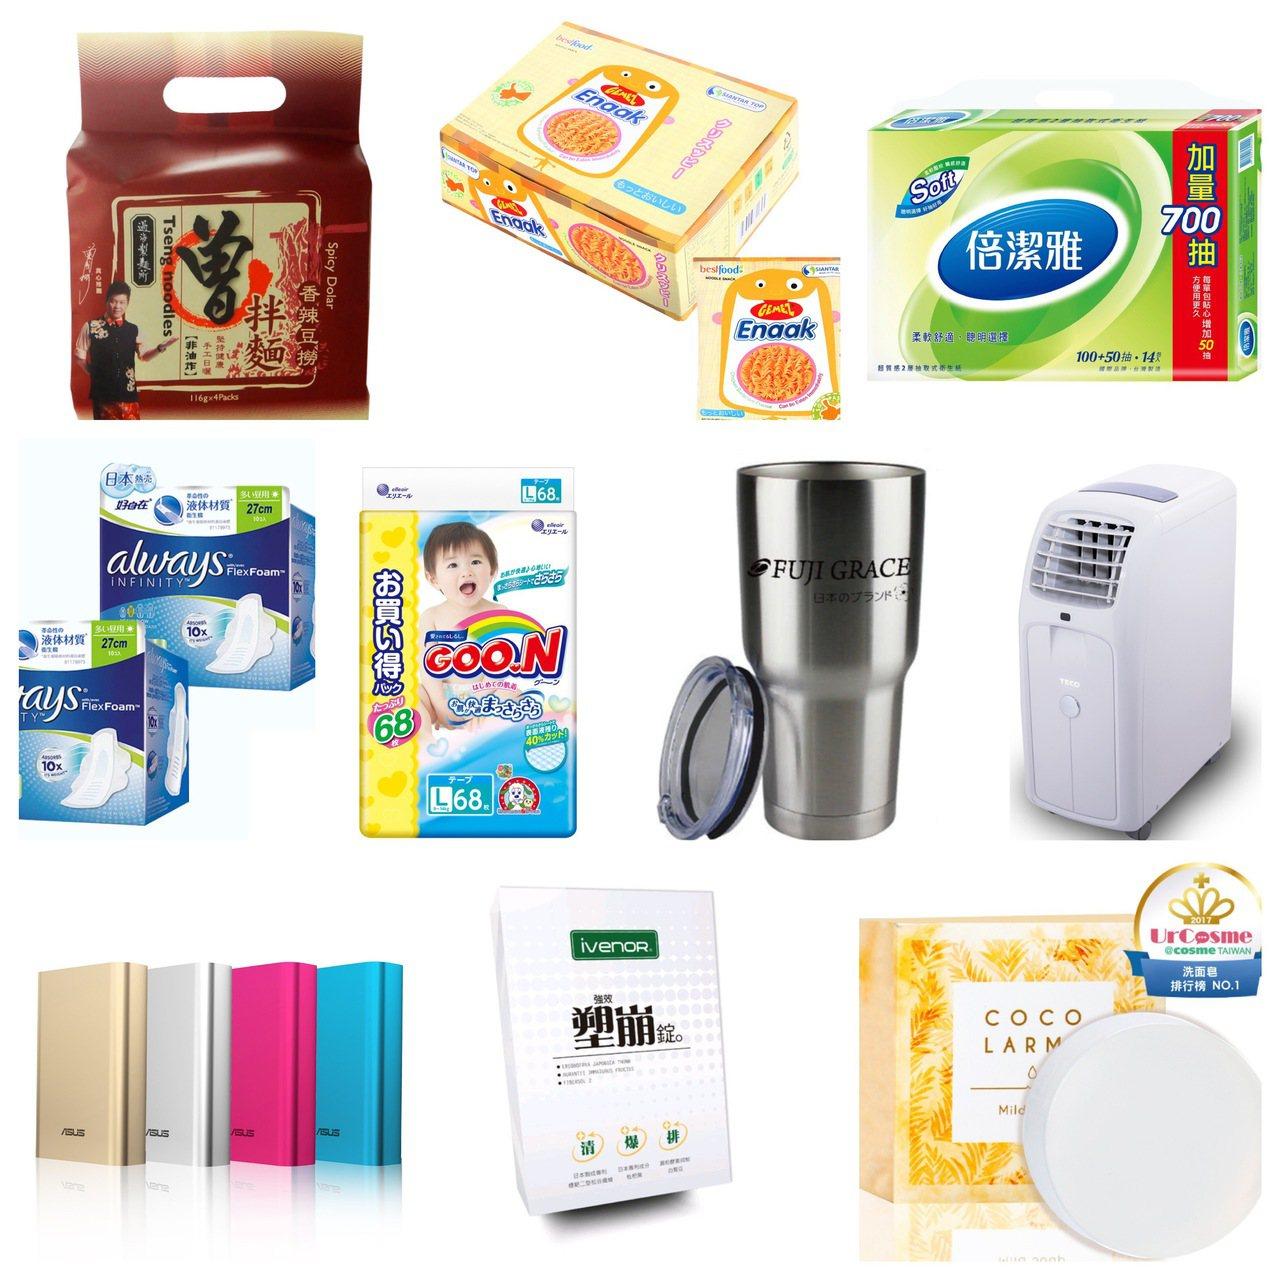 momo購物網公布2017年10大風雲商品。圖/momo購物網提供